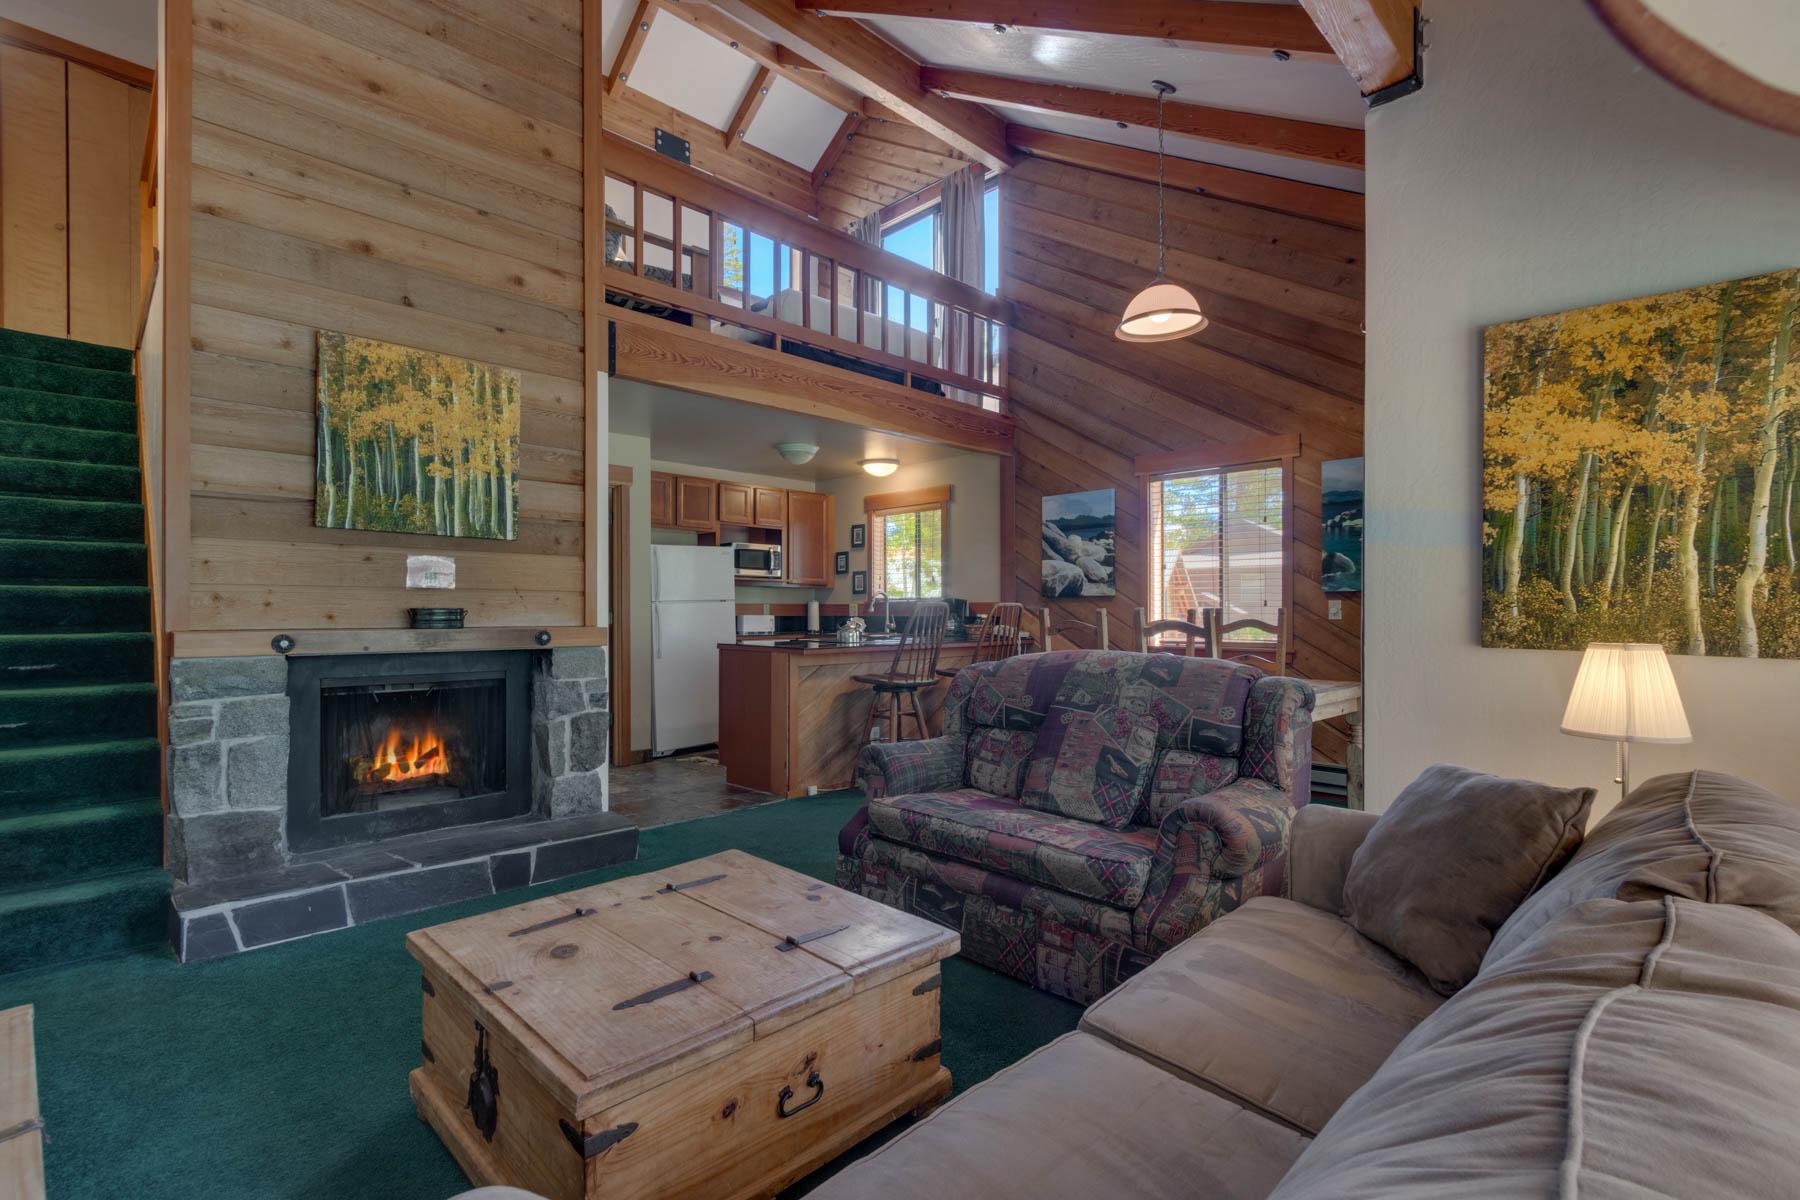 Property for Active at 725 Granlibakken Road Unit#8 CityTahoe City 725 Granlibakken Rd #81 Tahoe City, California 96145 United States